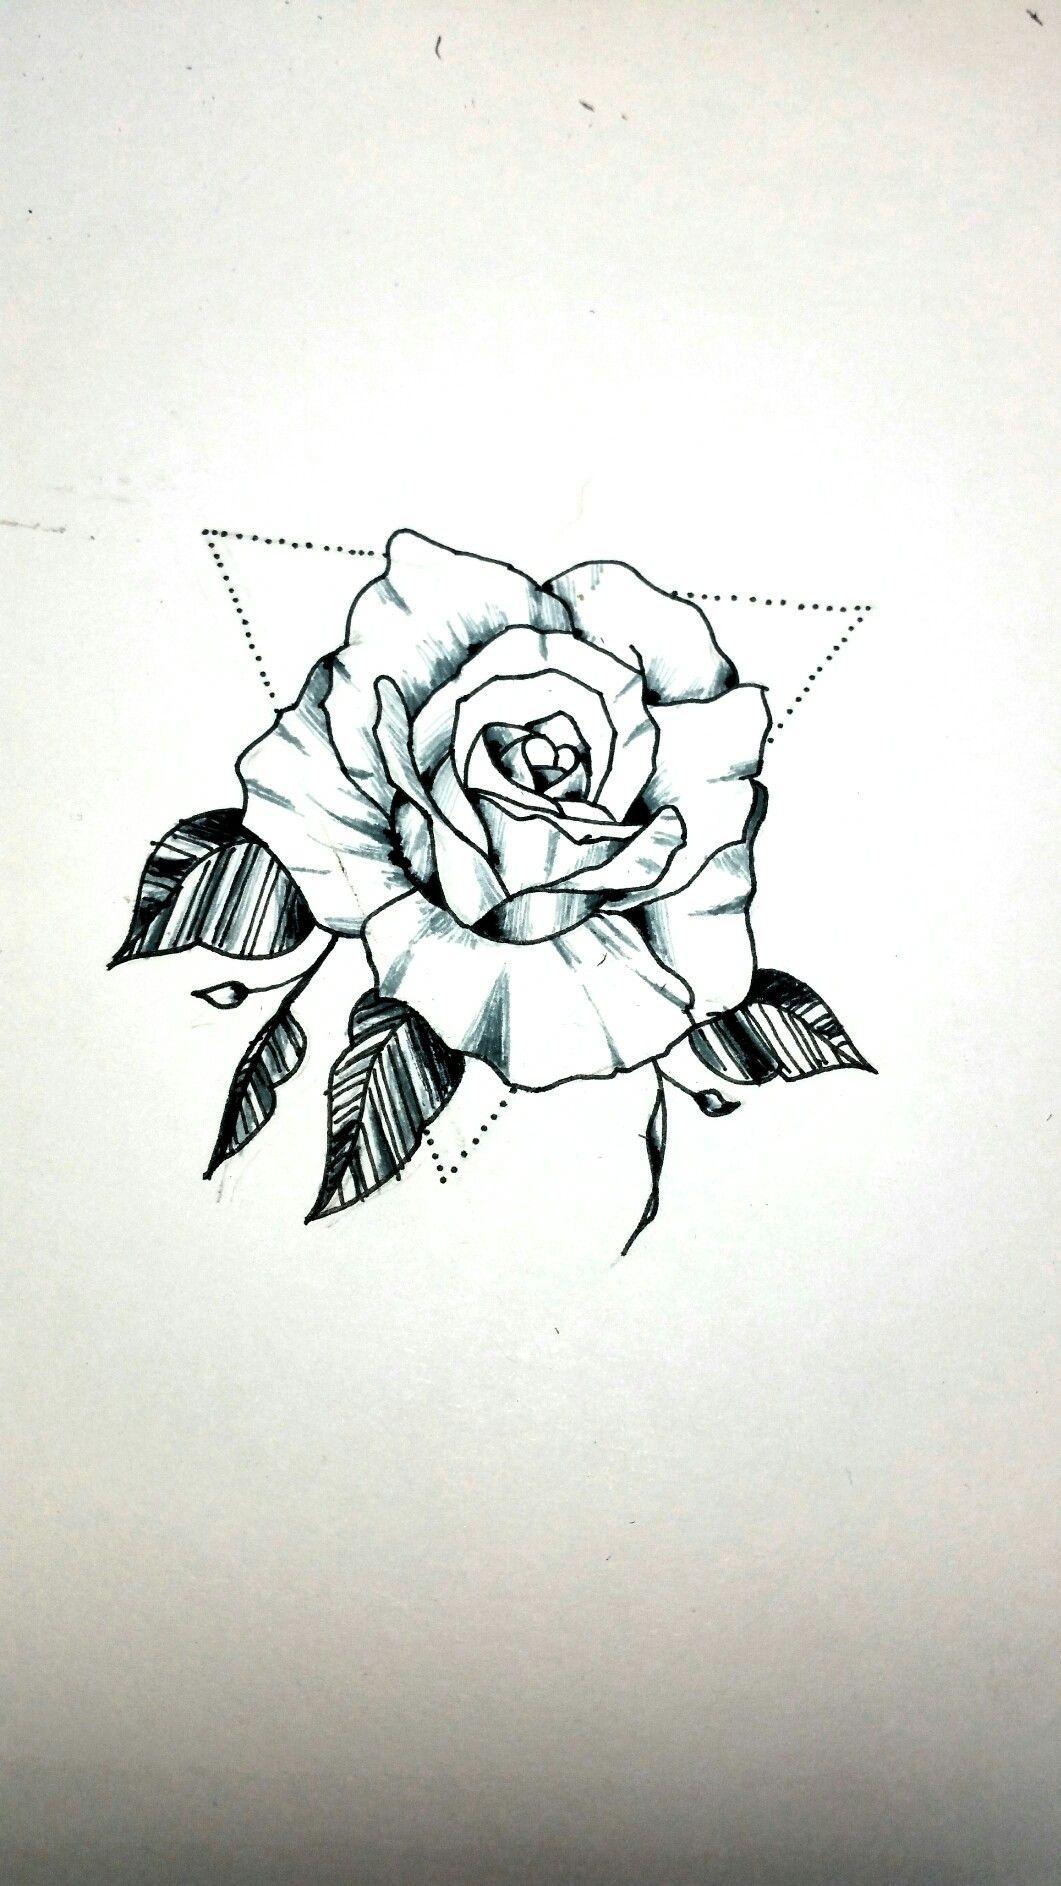 Rose Desing Tattoo Rosas Pretas Tatoo Tattoo Foto